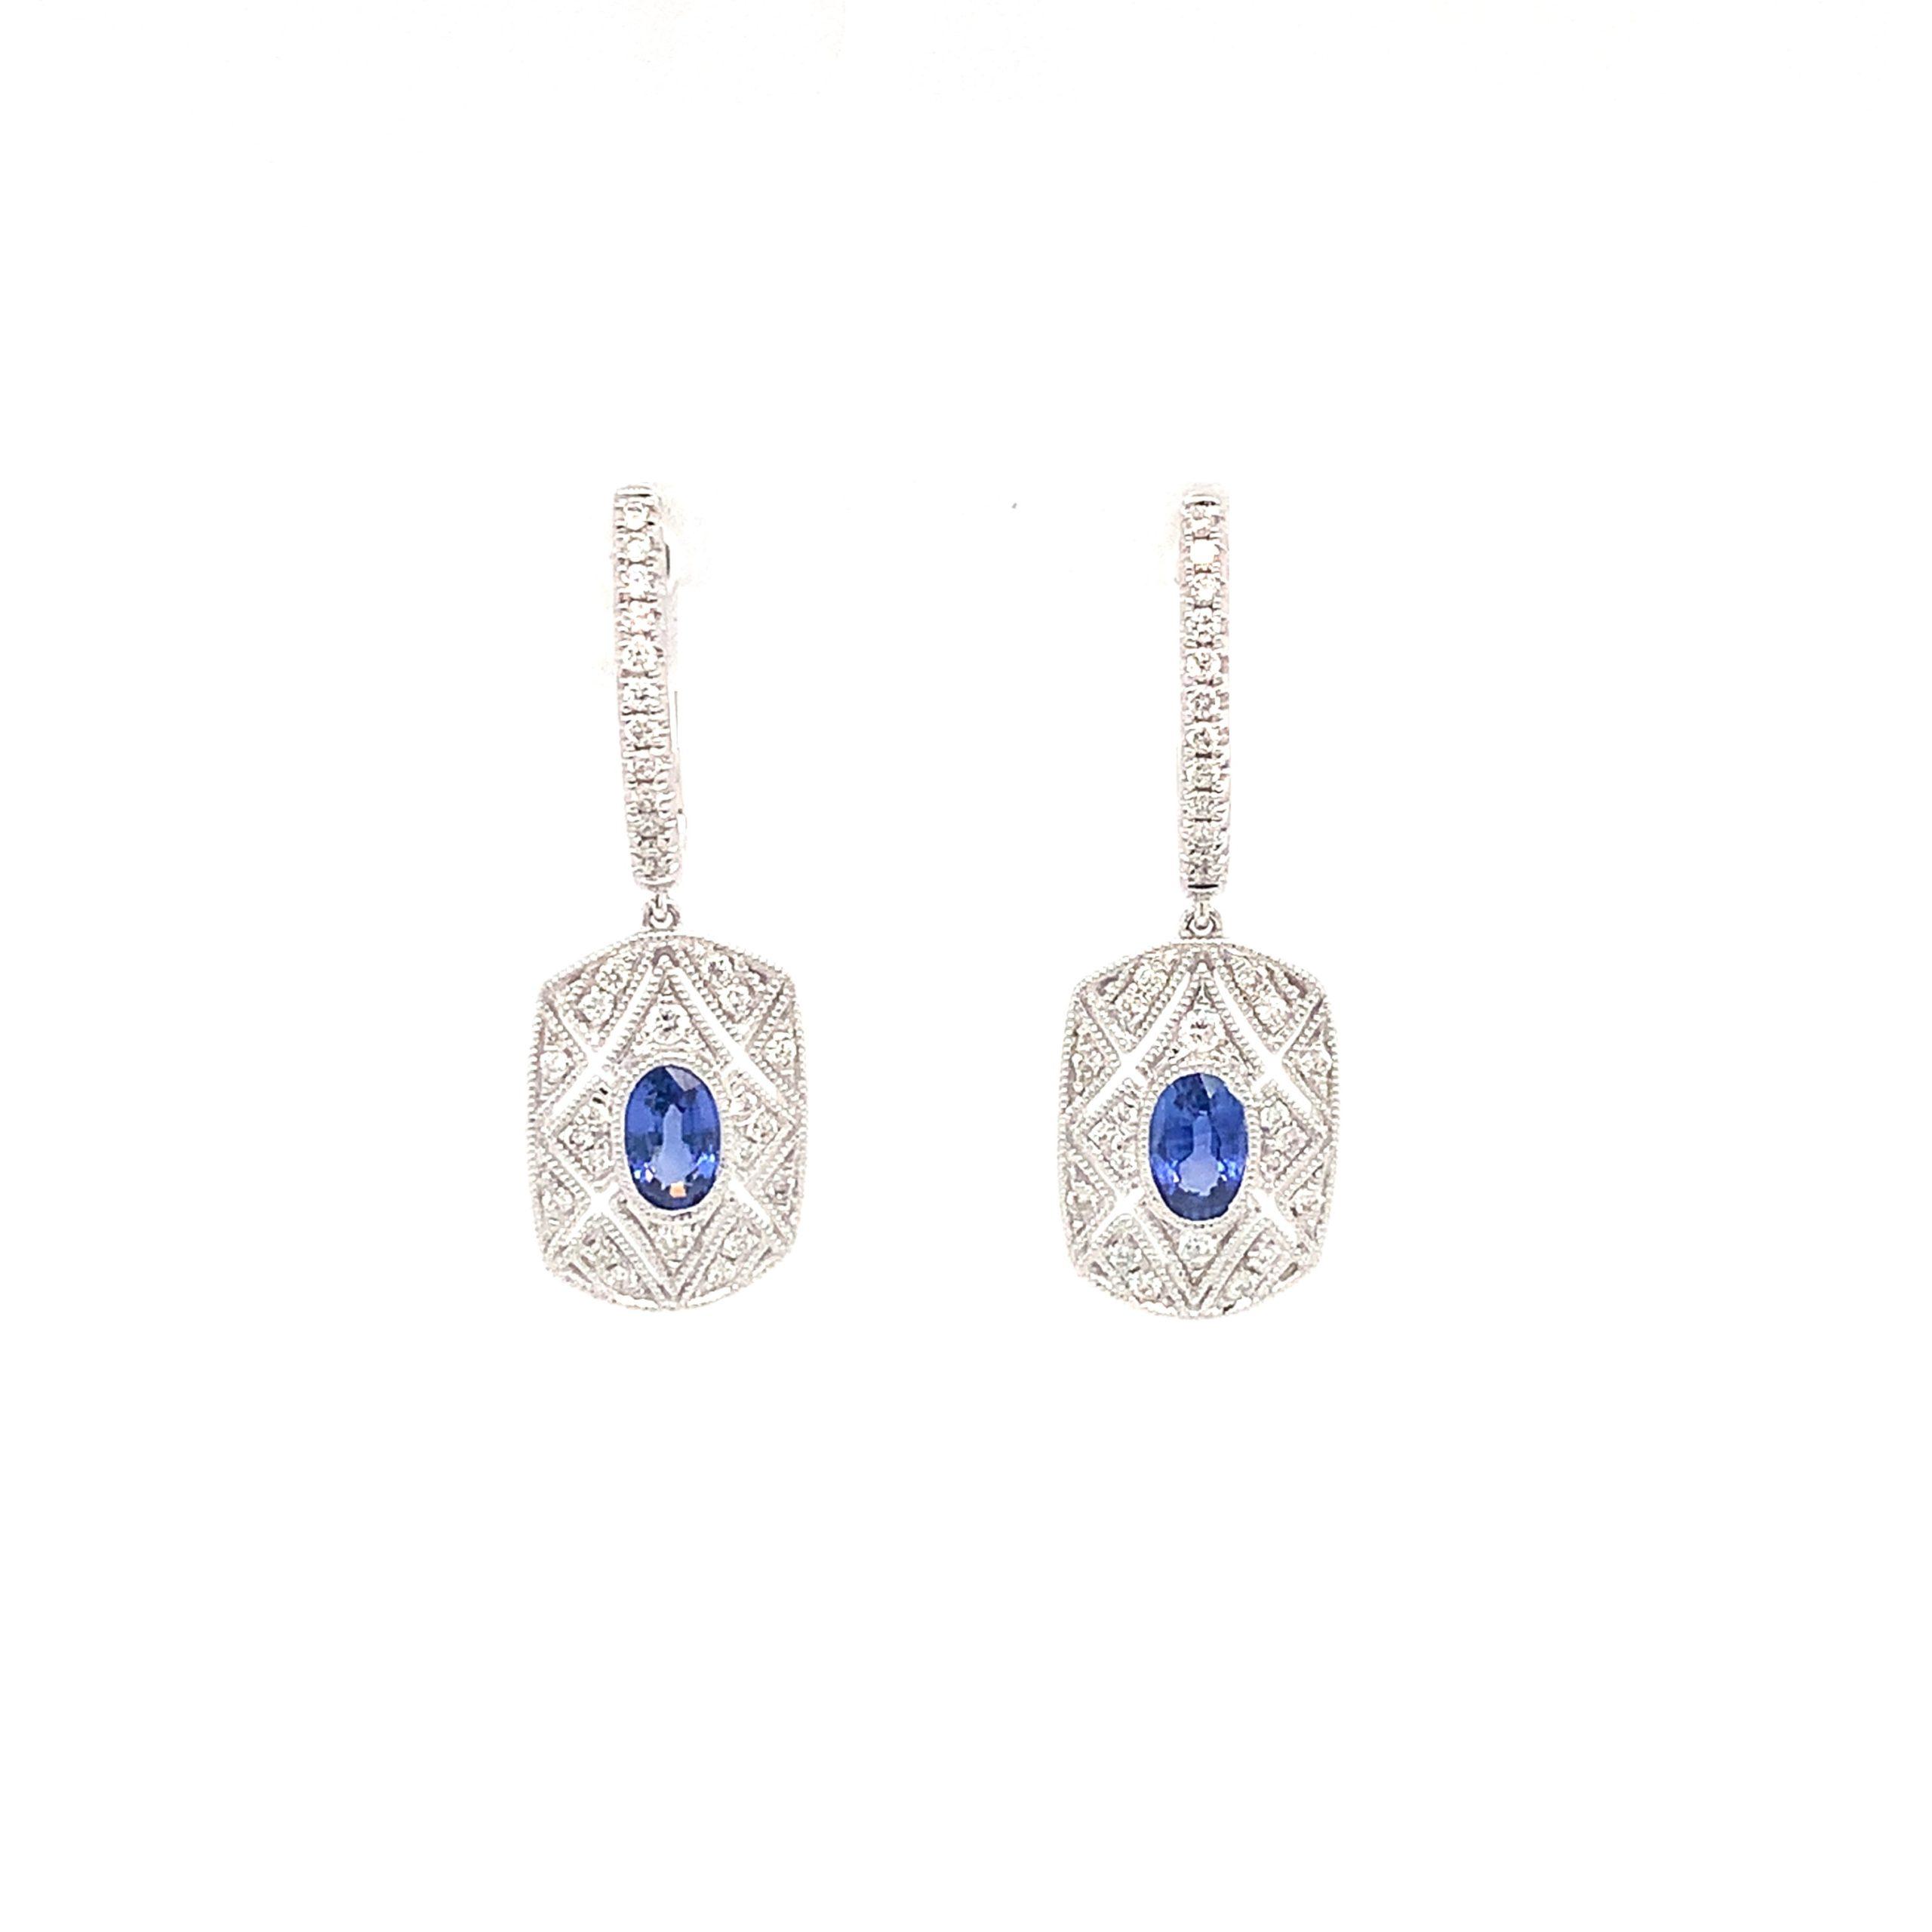 White Gold Sapphire Drop Earrings